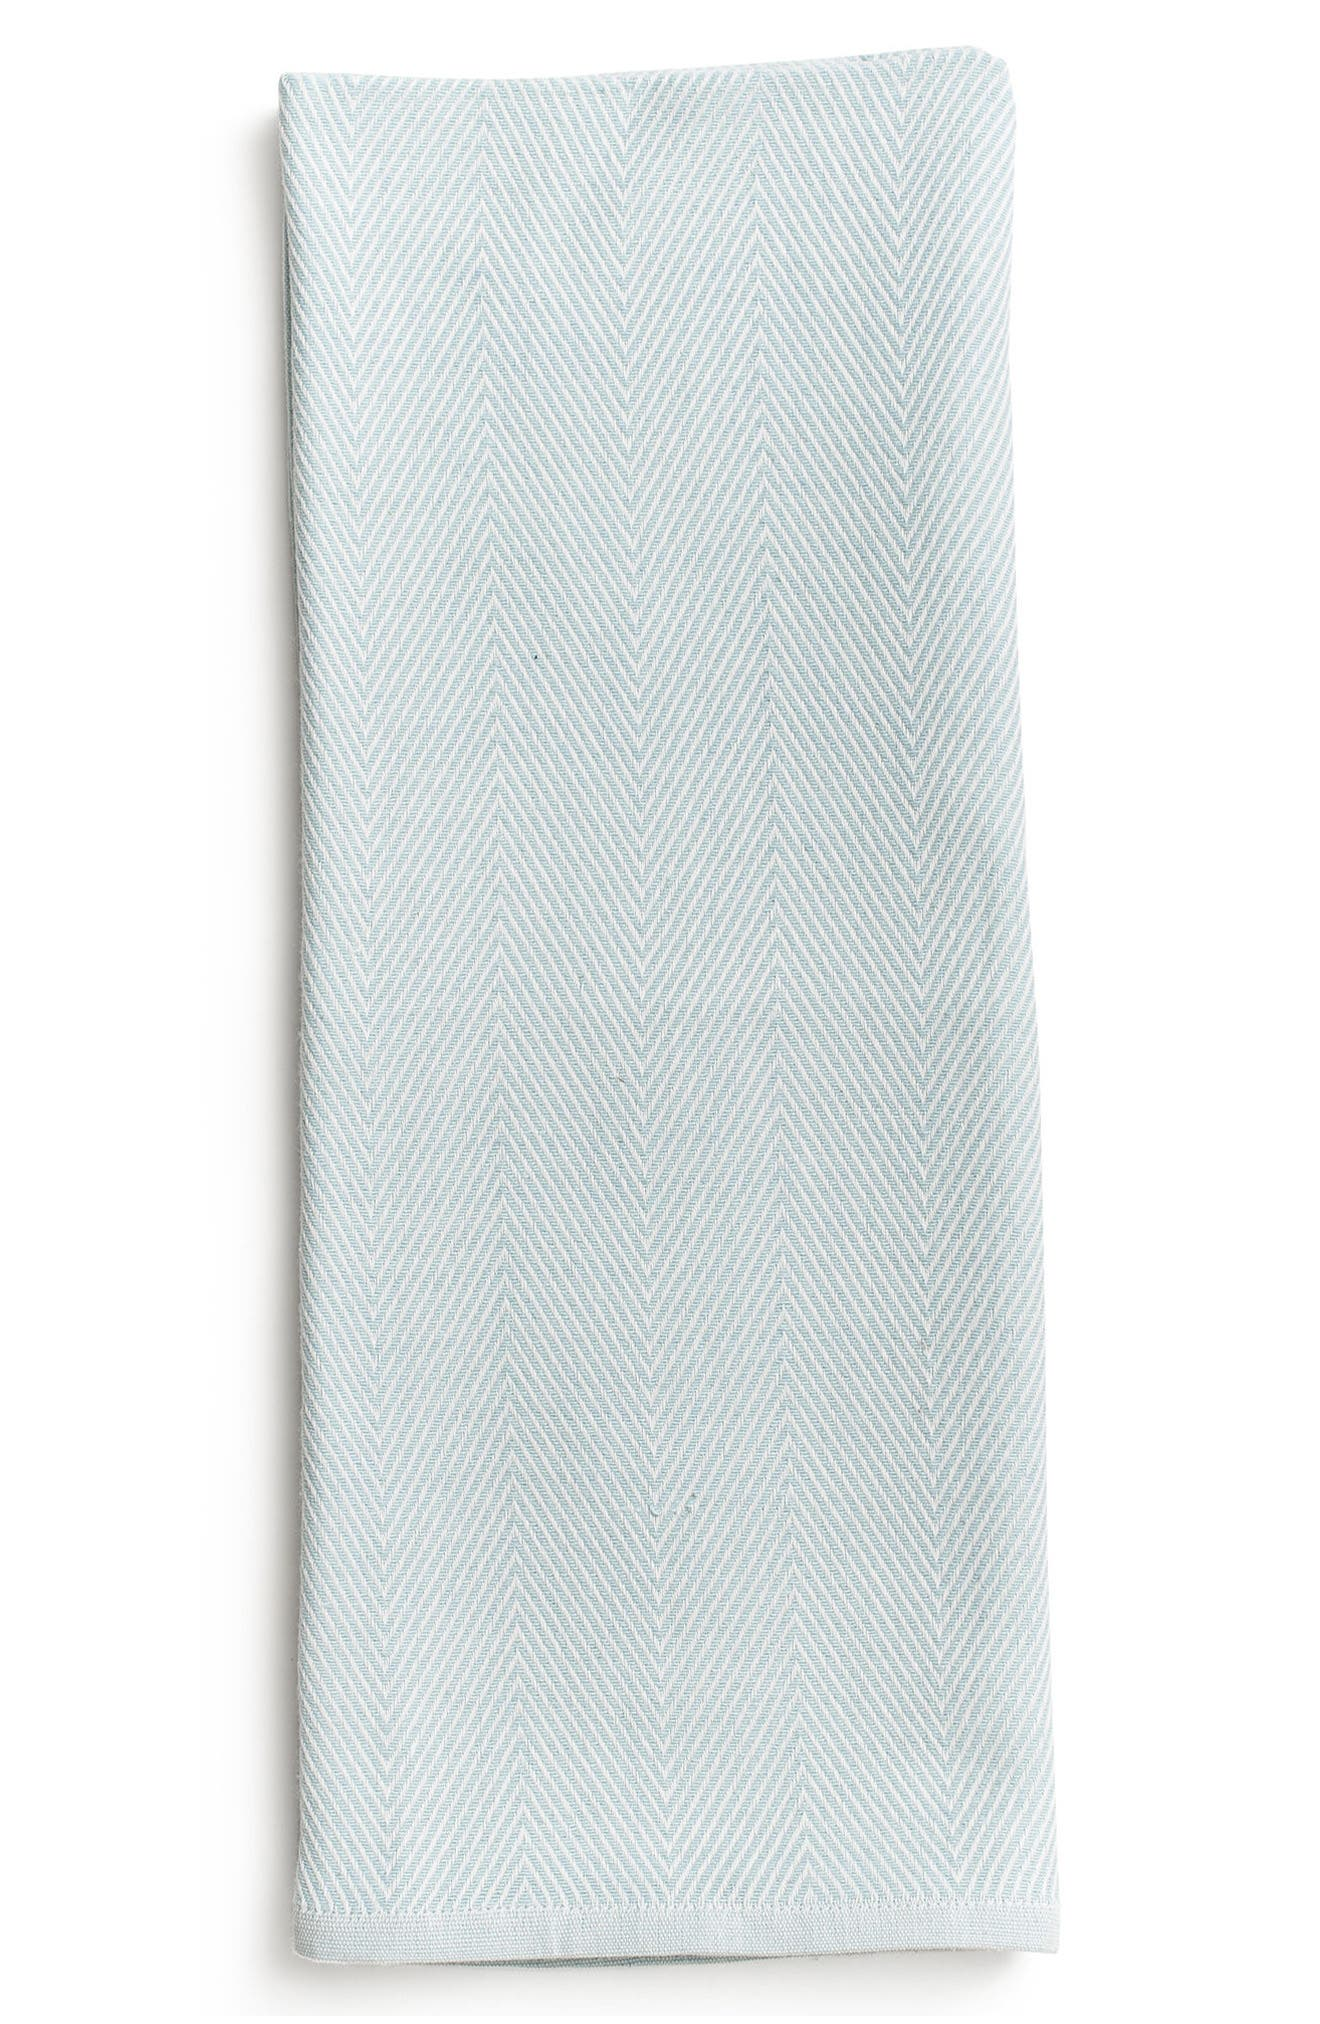 Herringbone Organic Cotton Blanket,                             Main thumbnail 1, color,                             401